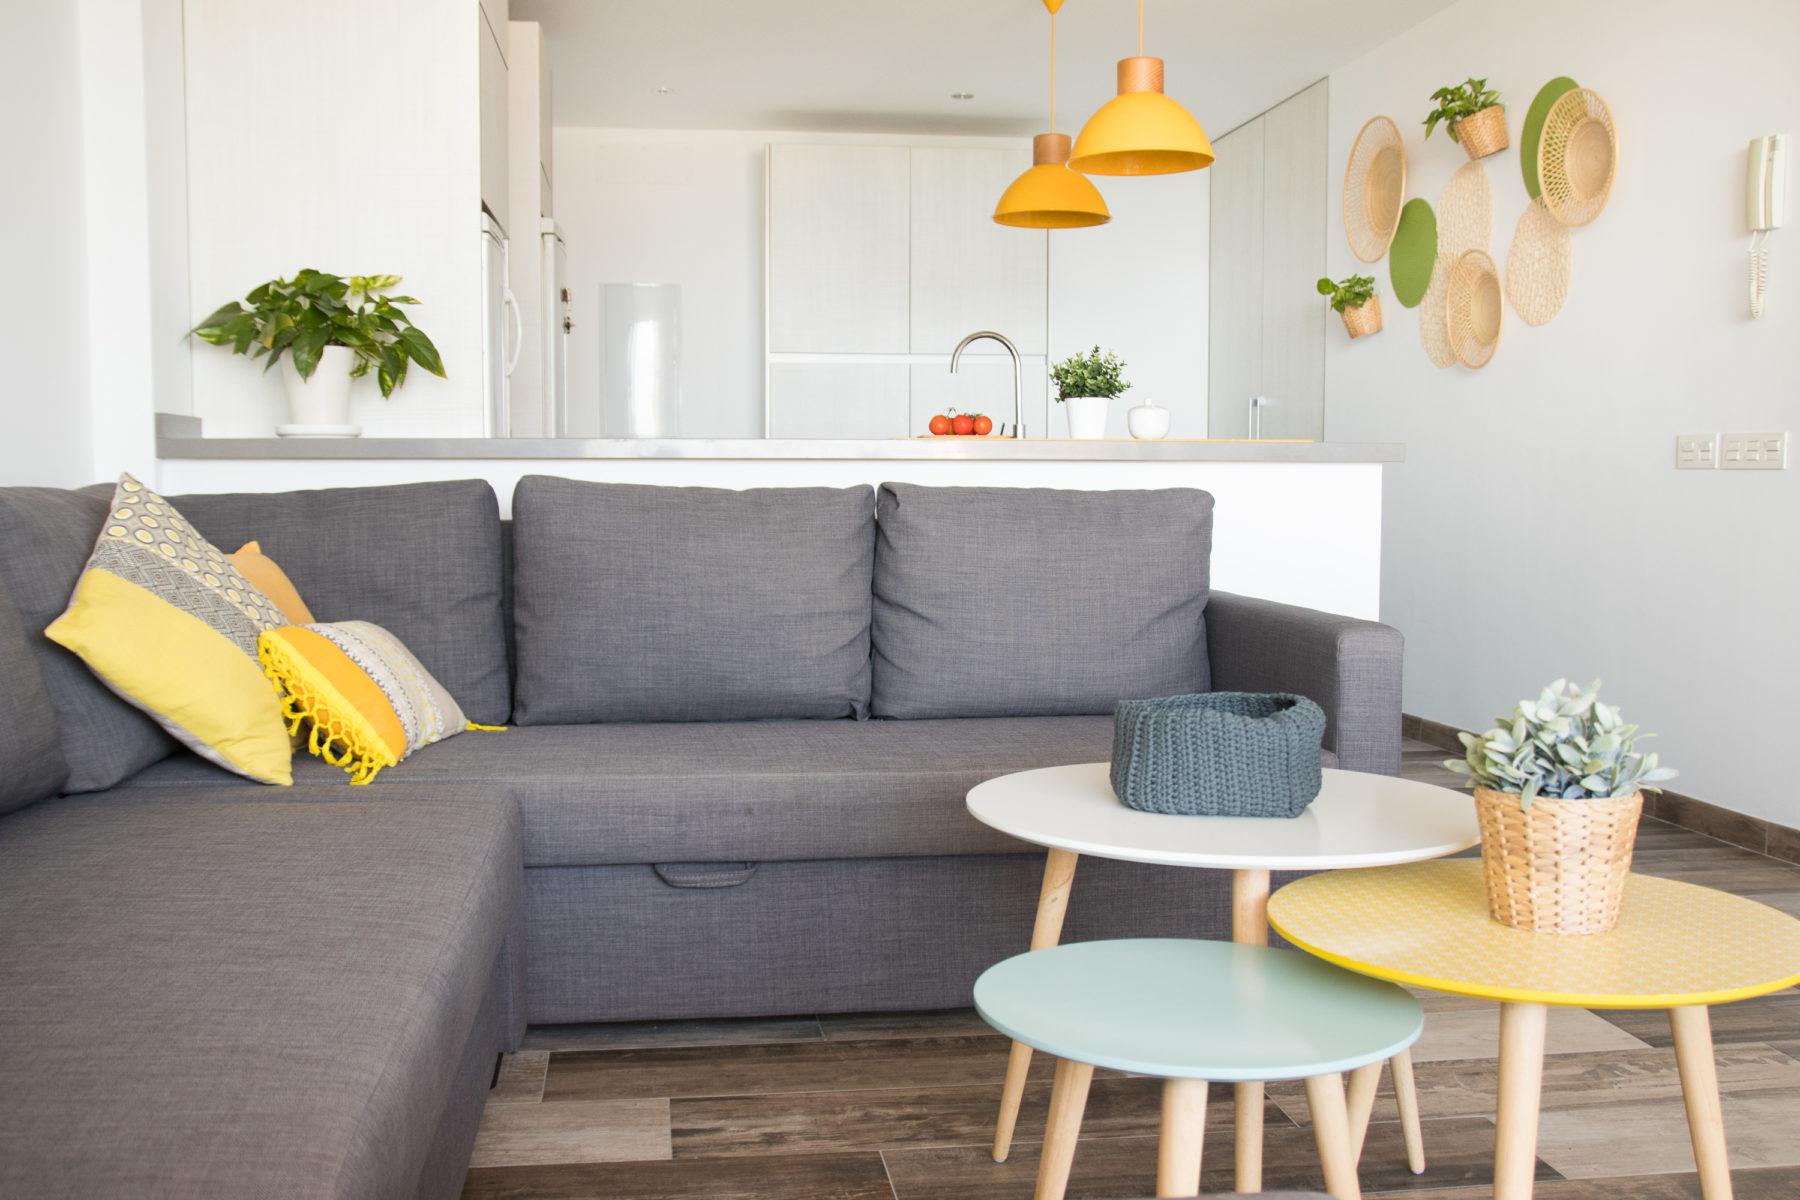 Minipisos Diseño interior en Málaga